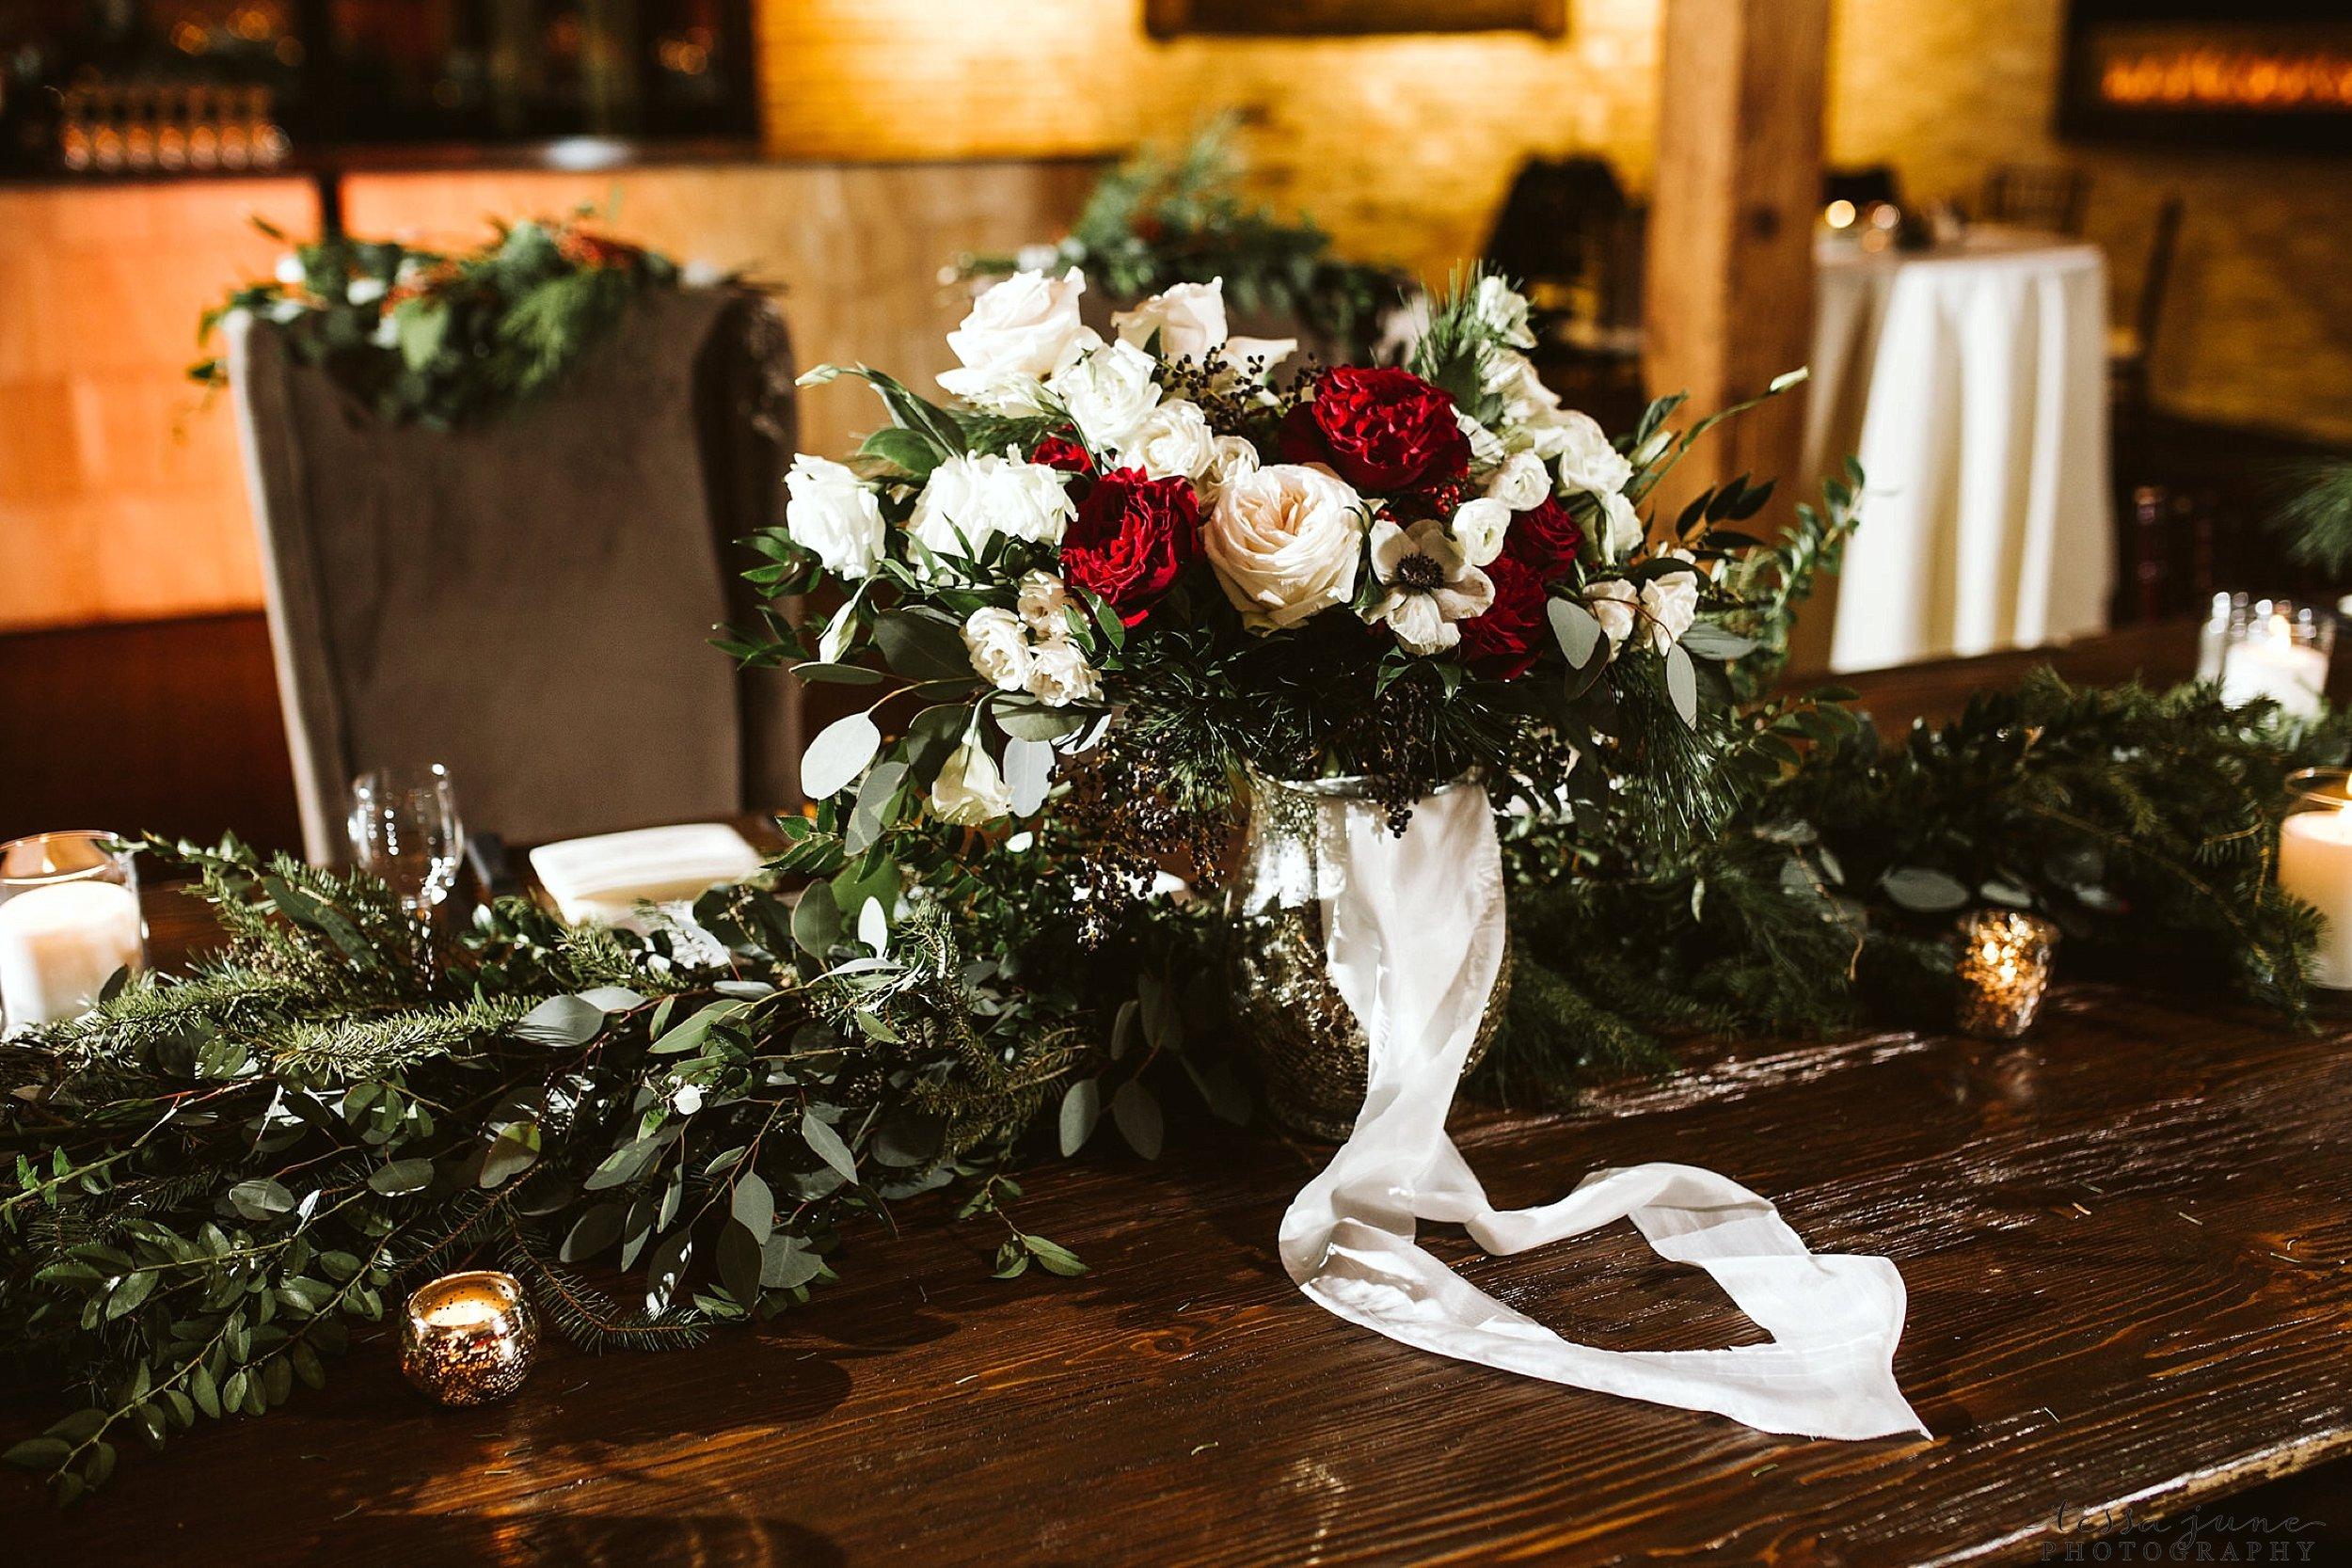 minneapolis-event-center-winter-romantic-snow-wedding-december-168.jpg